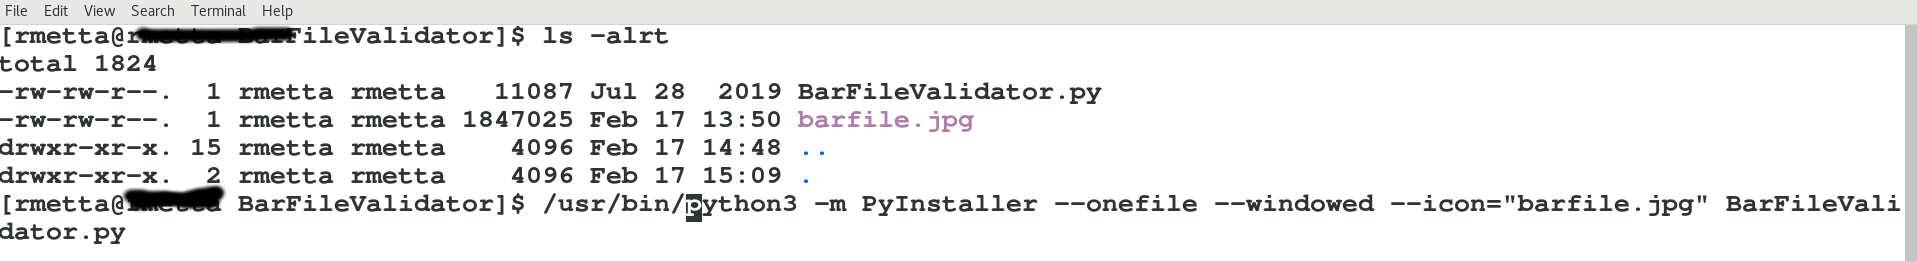 Pyinstaller command